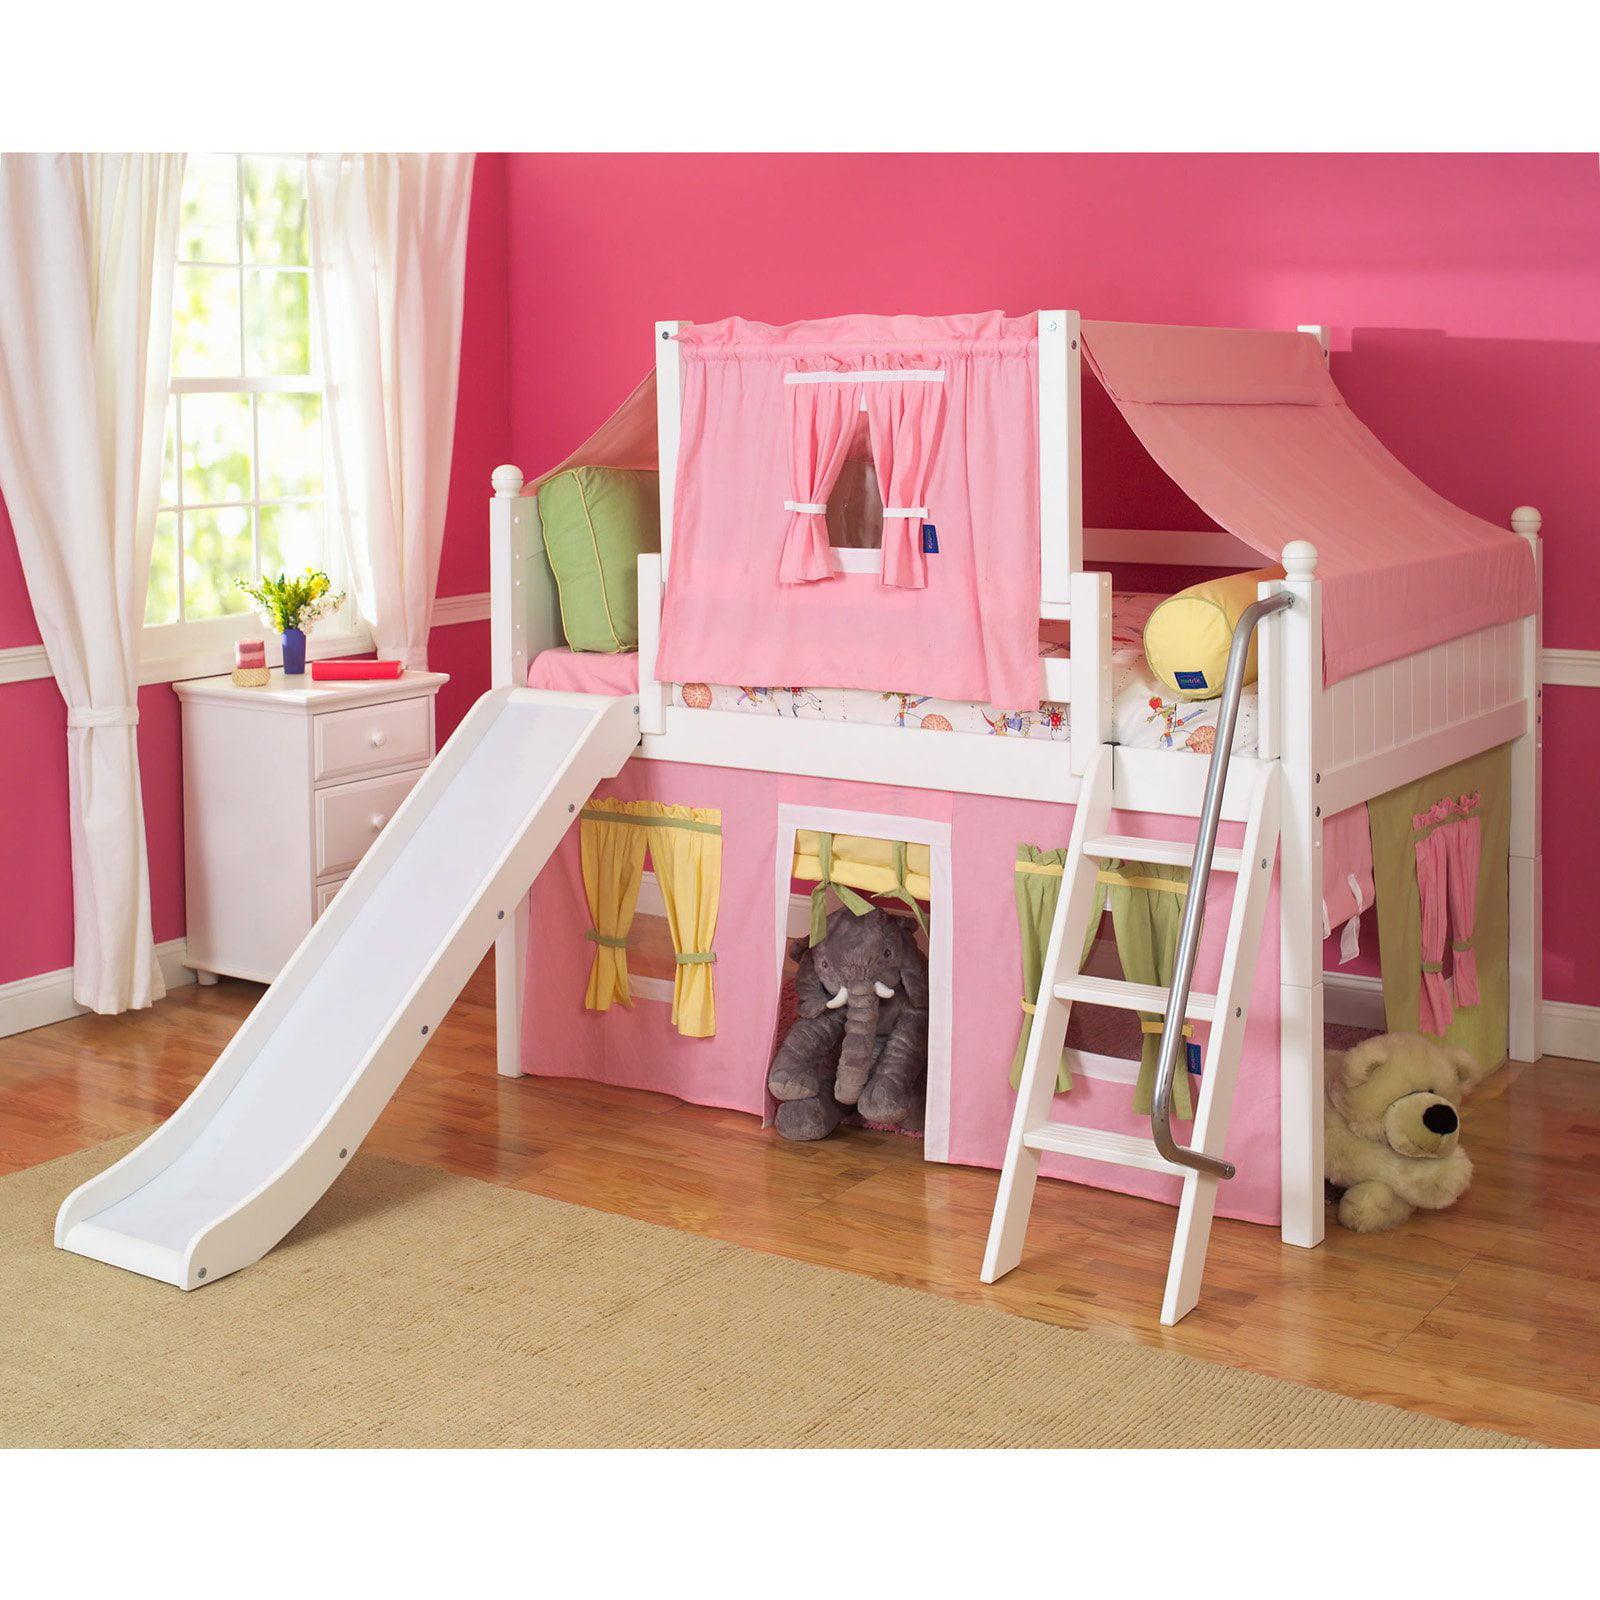 Girls loft bed with slide - Girls Loft Bed With Slide 5